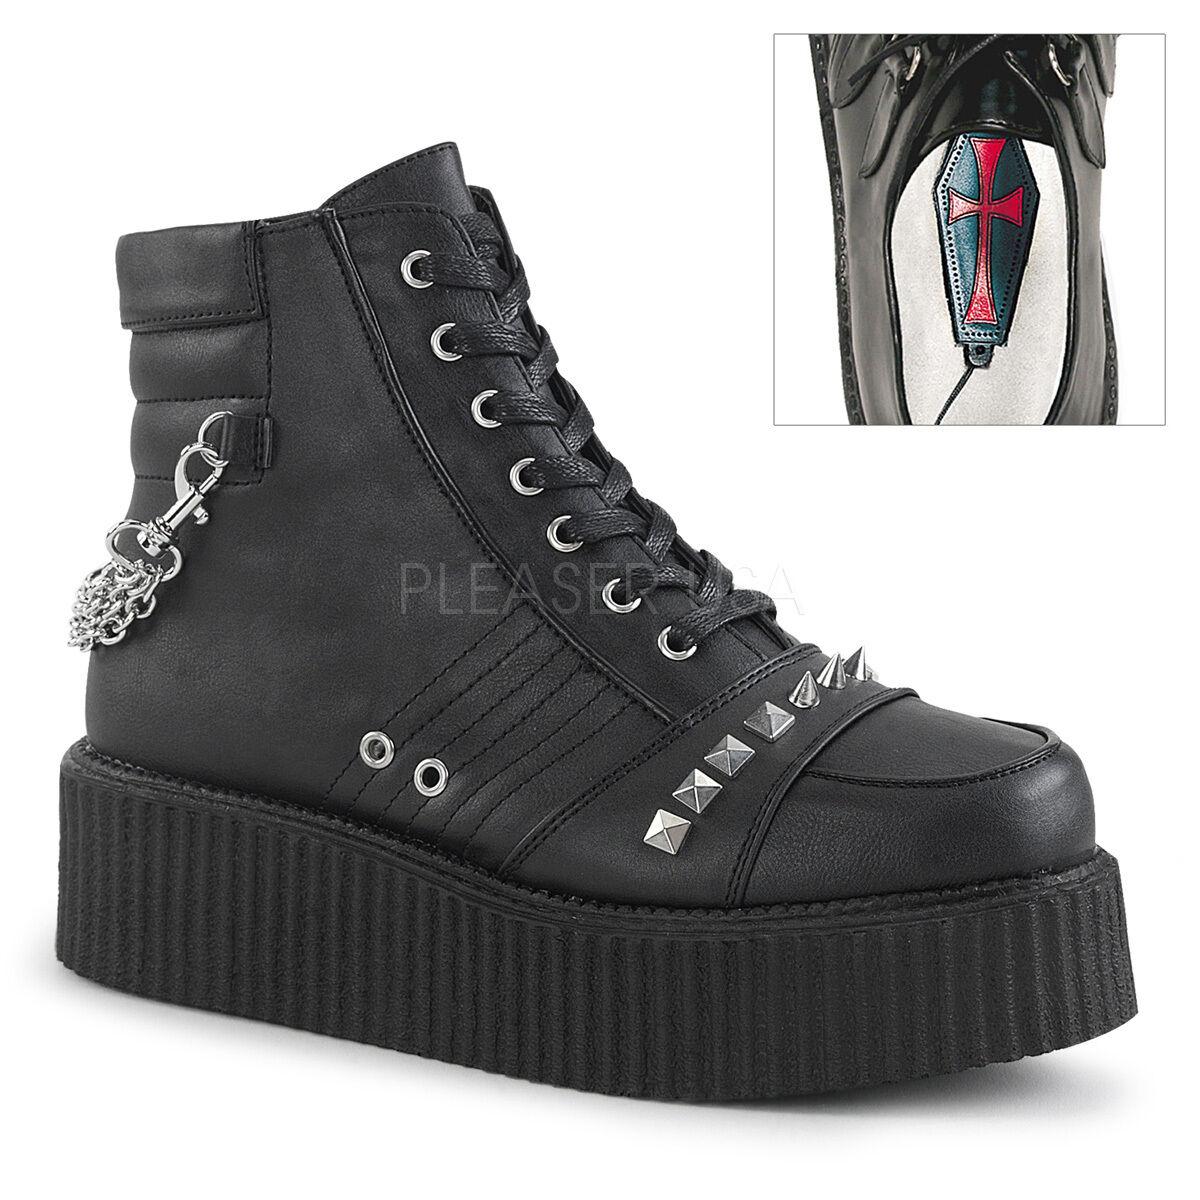 Demonia 2  Vegan Chain Platform Studded Spike Creeper Boots Goth Punk Men's 4-14